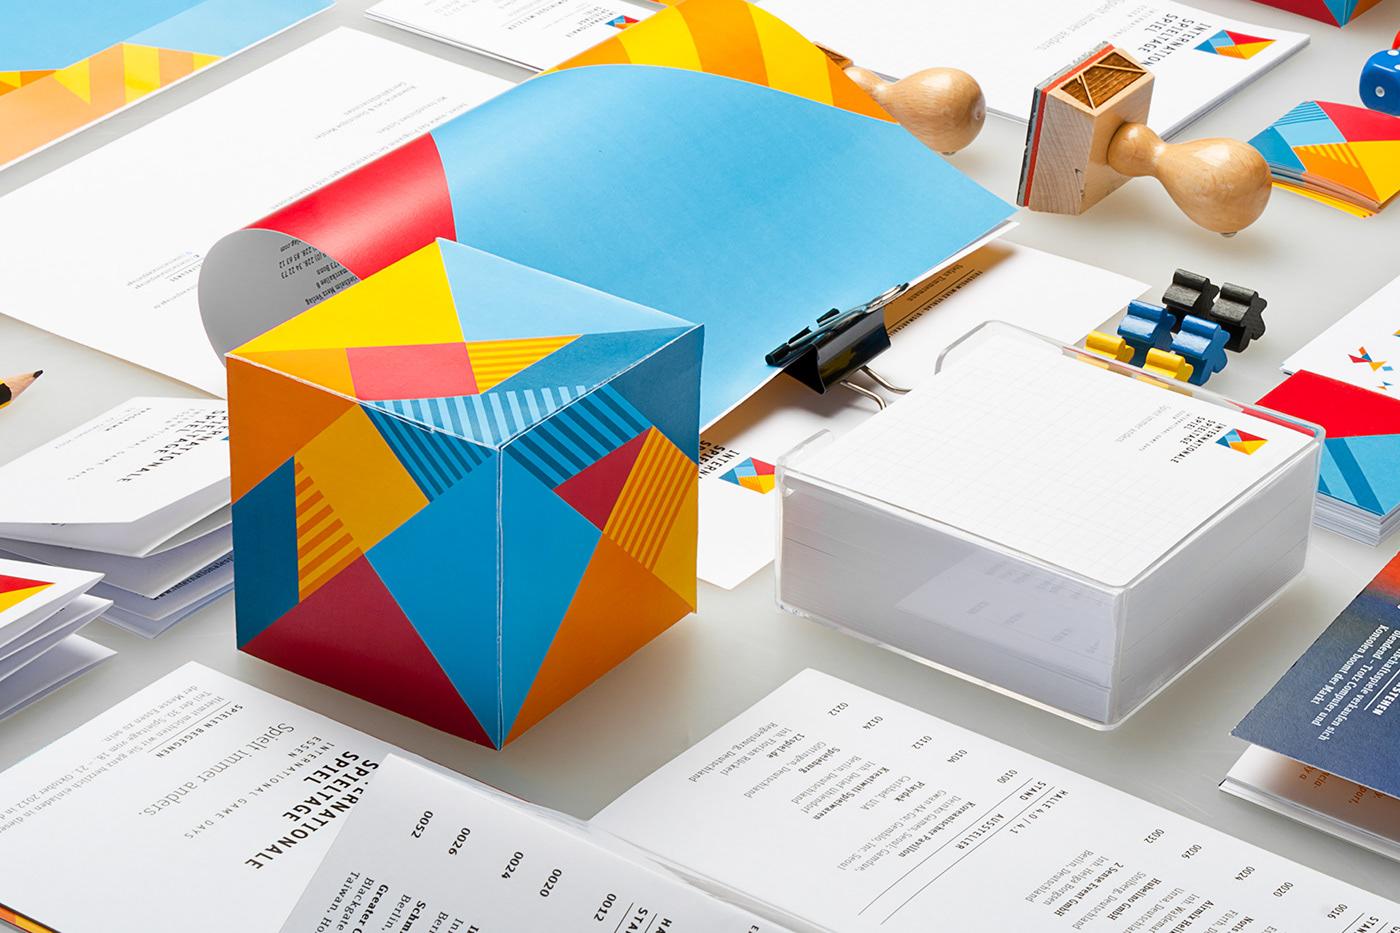 Corporate Identity Corporate Design  advertising   editorial design trade fair Fair board games essen FH Aachen tangram game logo